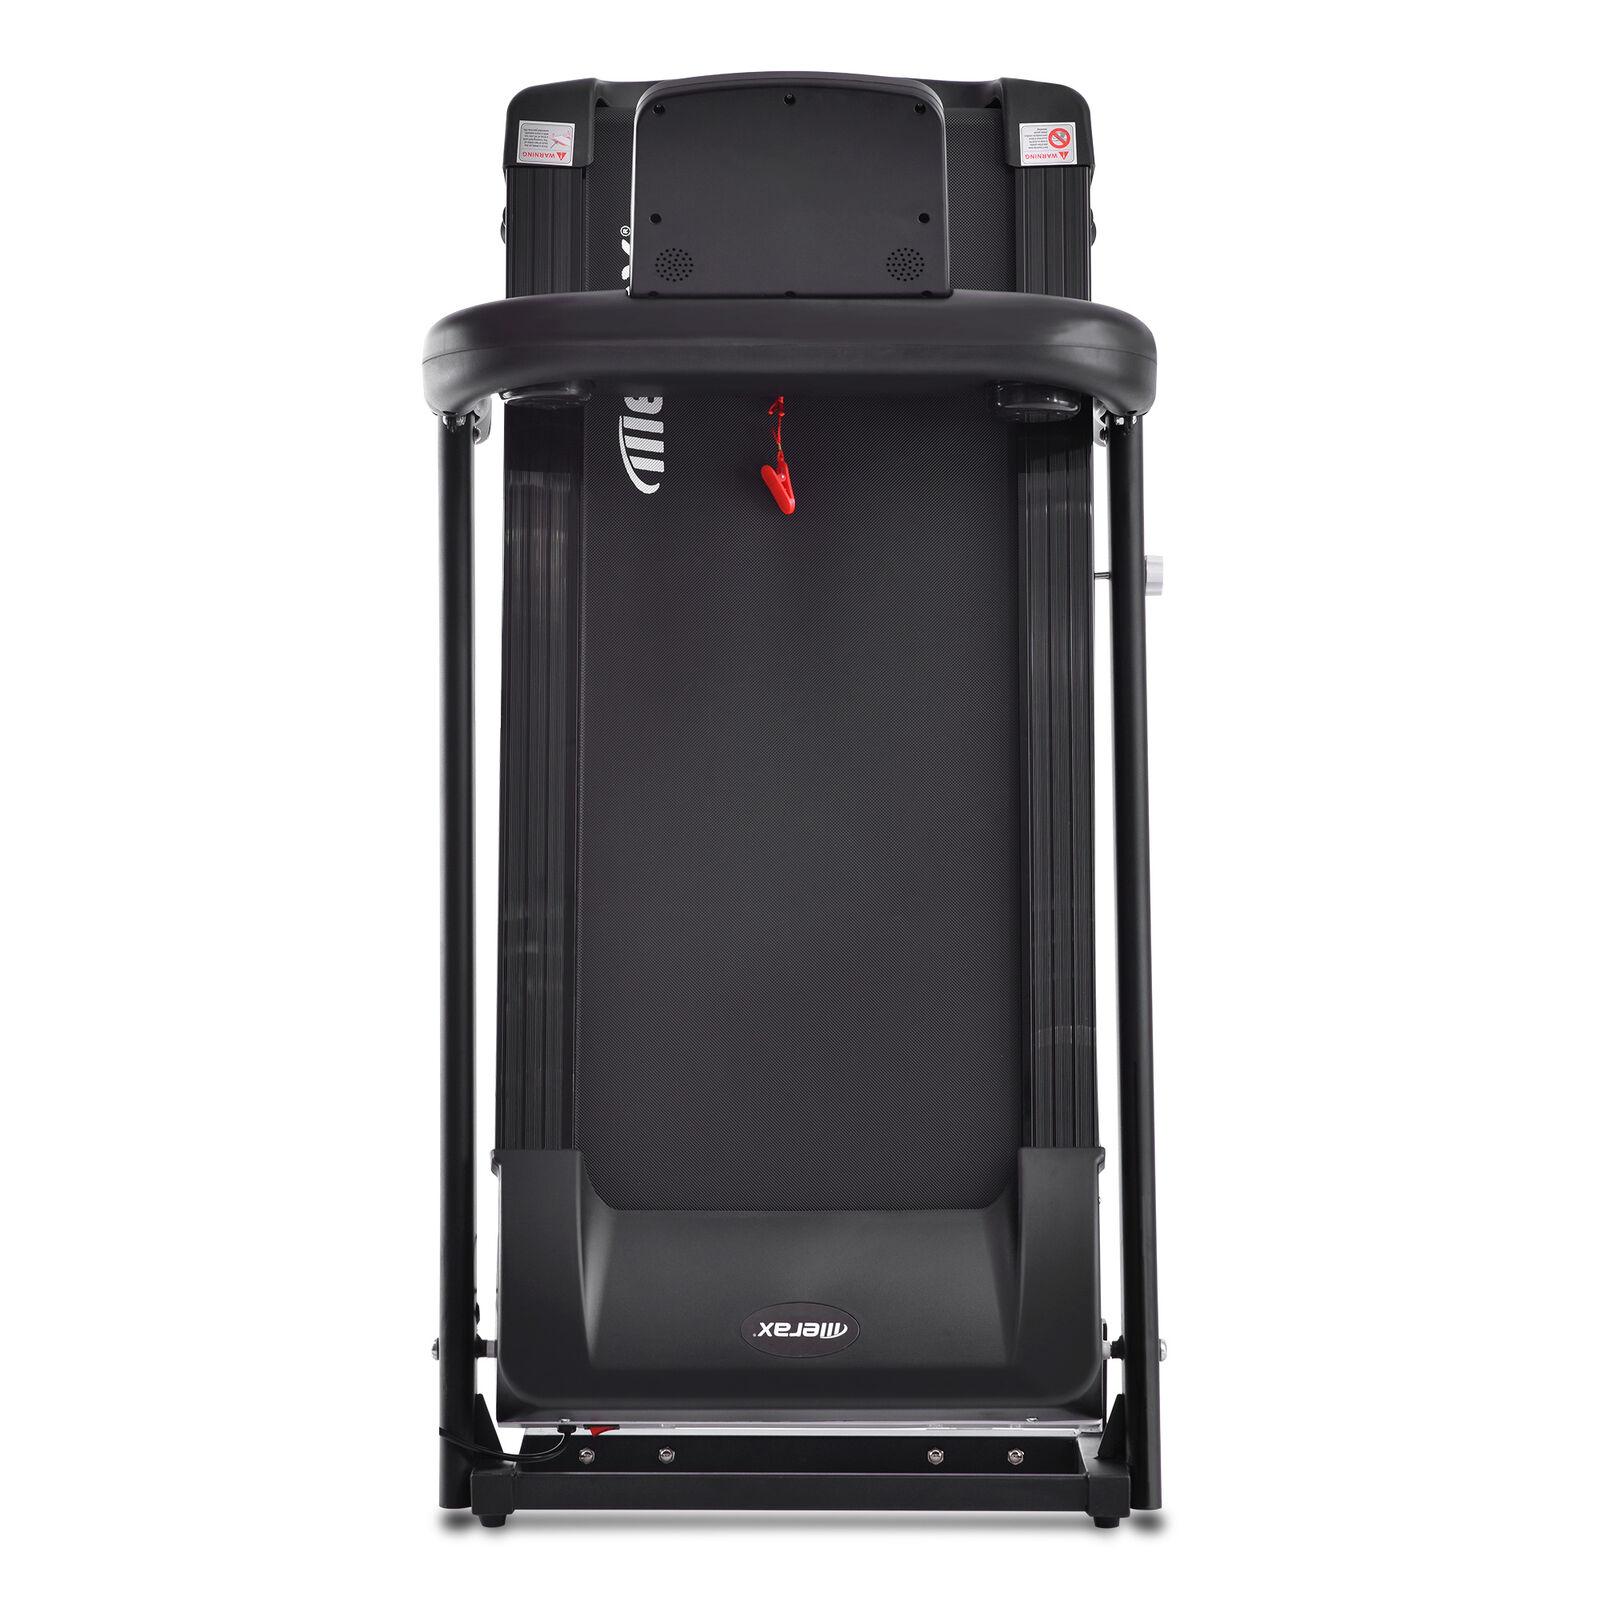 ac426c8cbd7 Merax 1800W 2.25HP Folding Electric Treadmill Motorized Power Running  Machine 84 for sale online